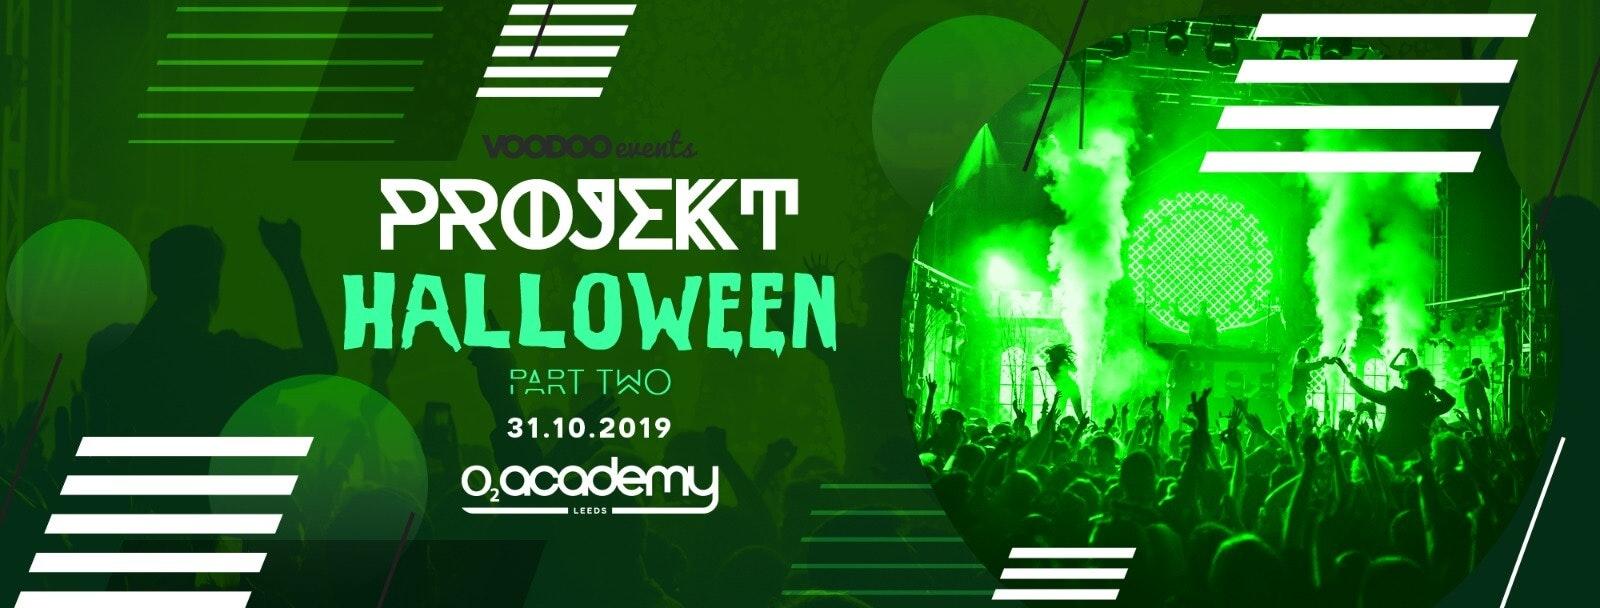 PROJEKT Halloween PT 2